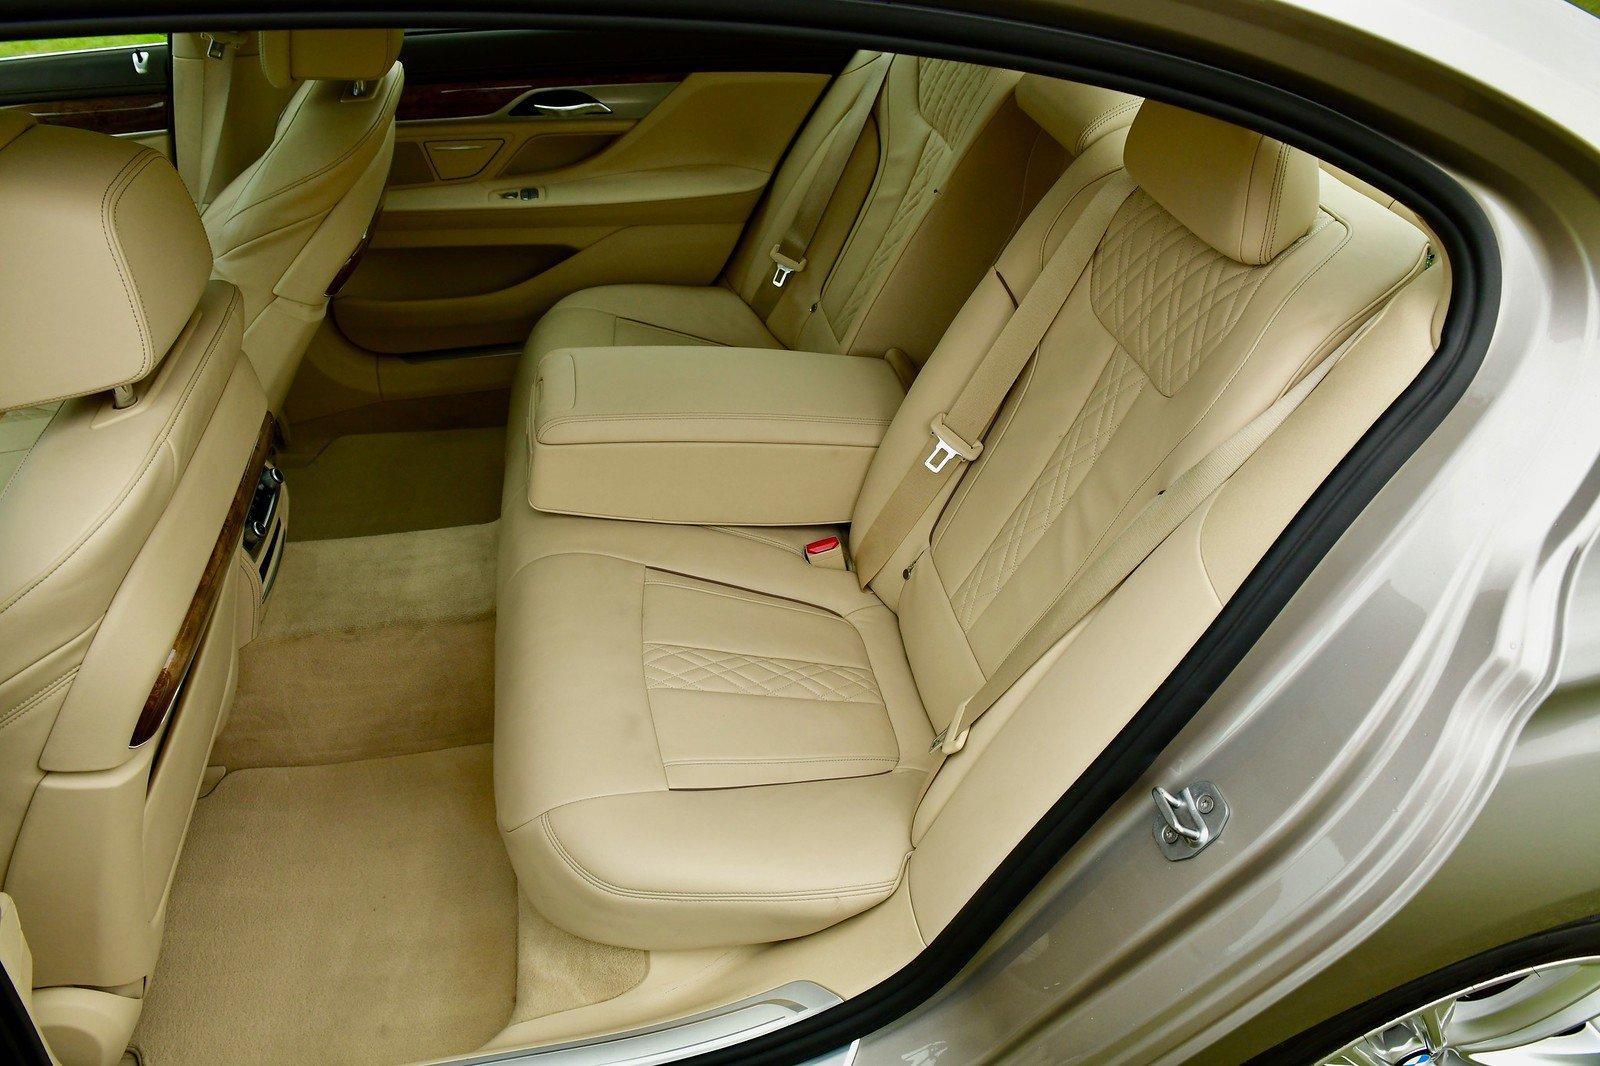 2016 BMW 7 Series Twin Turbo  740Li LWB Saloon 4dr Petrol  SOLD (picture 5 of 6)